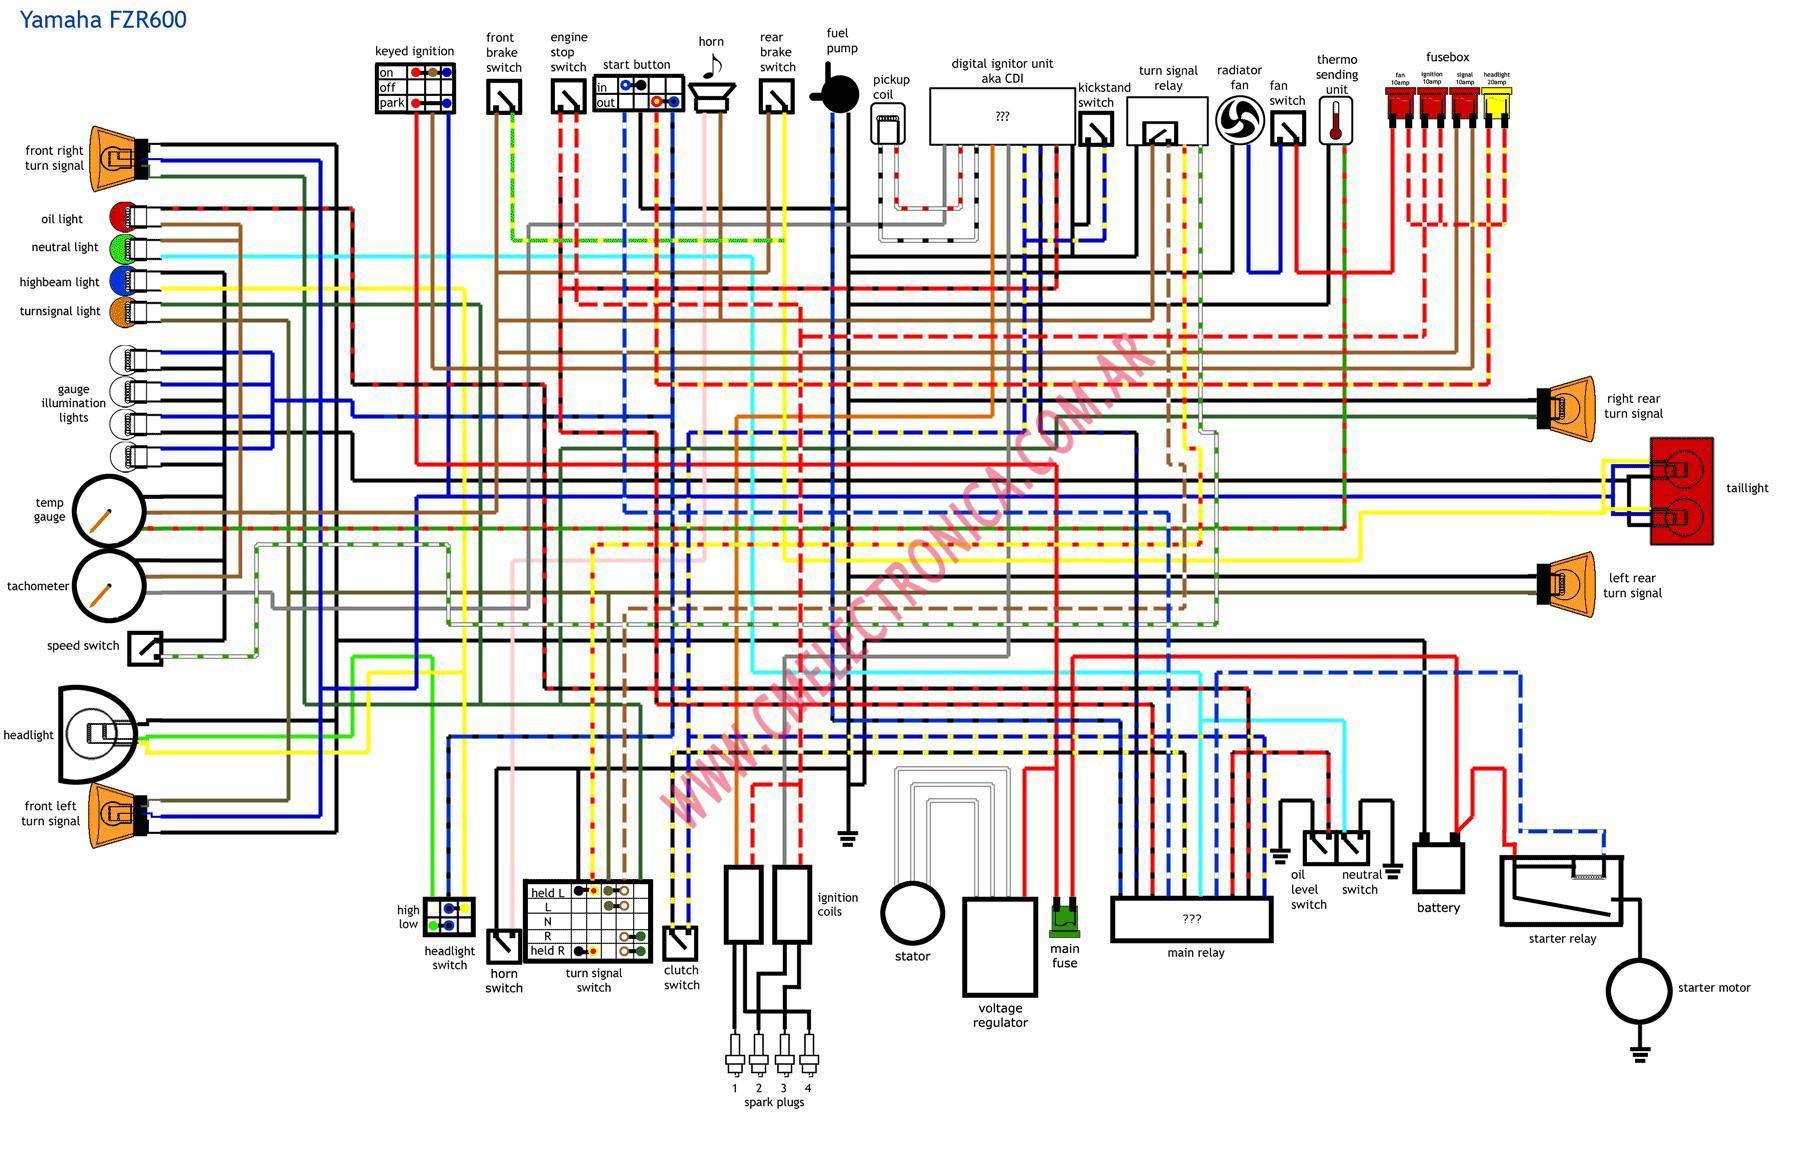 hight resolution of diagrama yamaha fzr600 yamaha 90 outboard wiring diagram yamaha atv wiring diagram